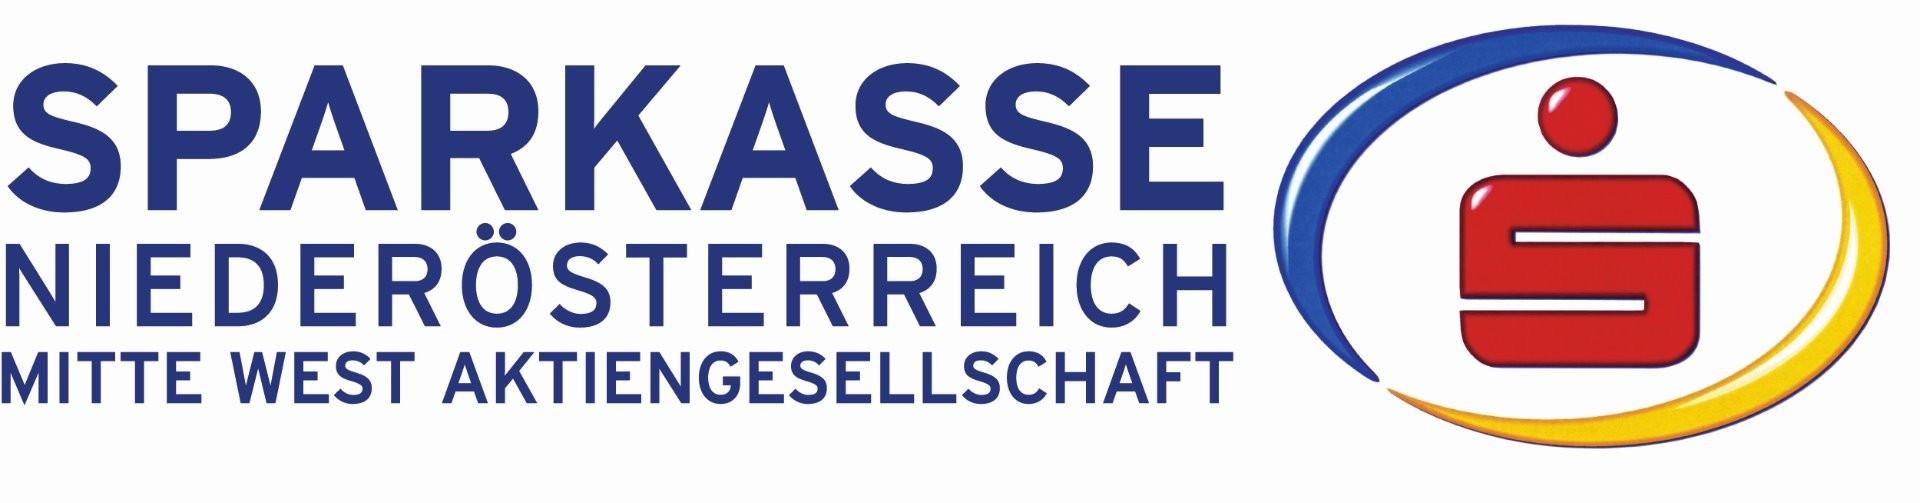 Sparkasse NÖ_Logo.jpg